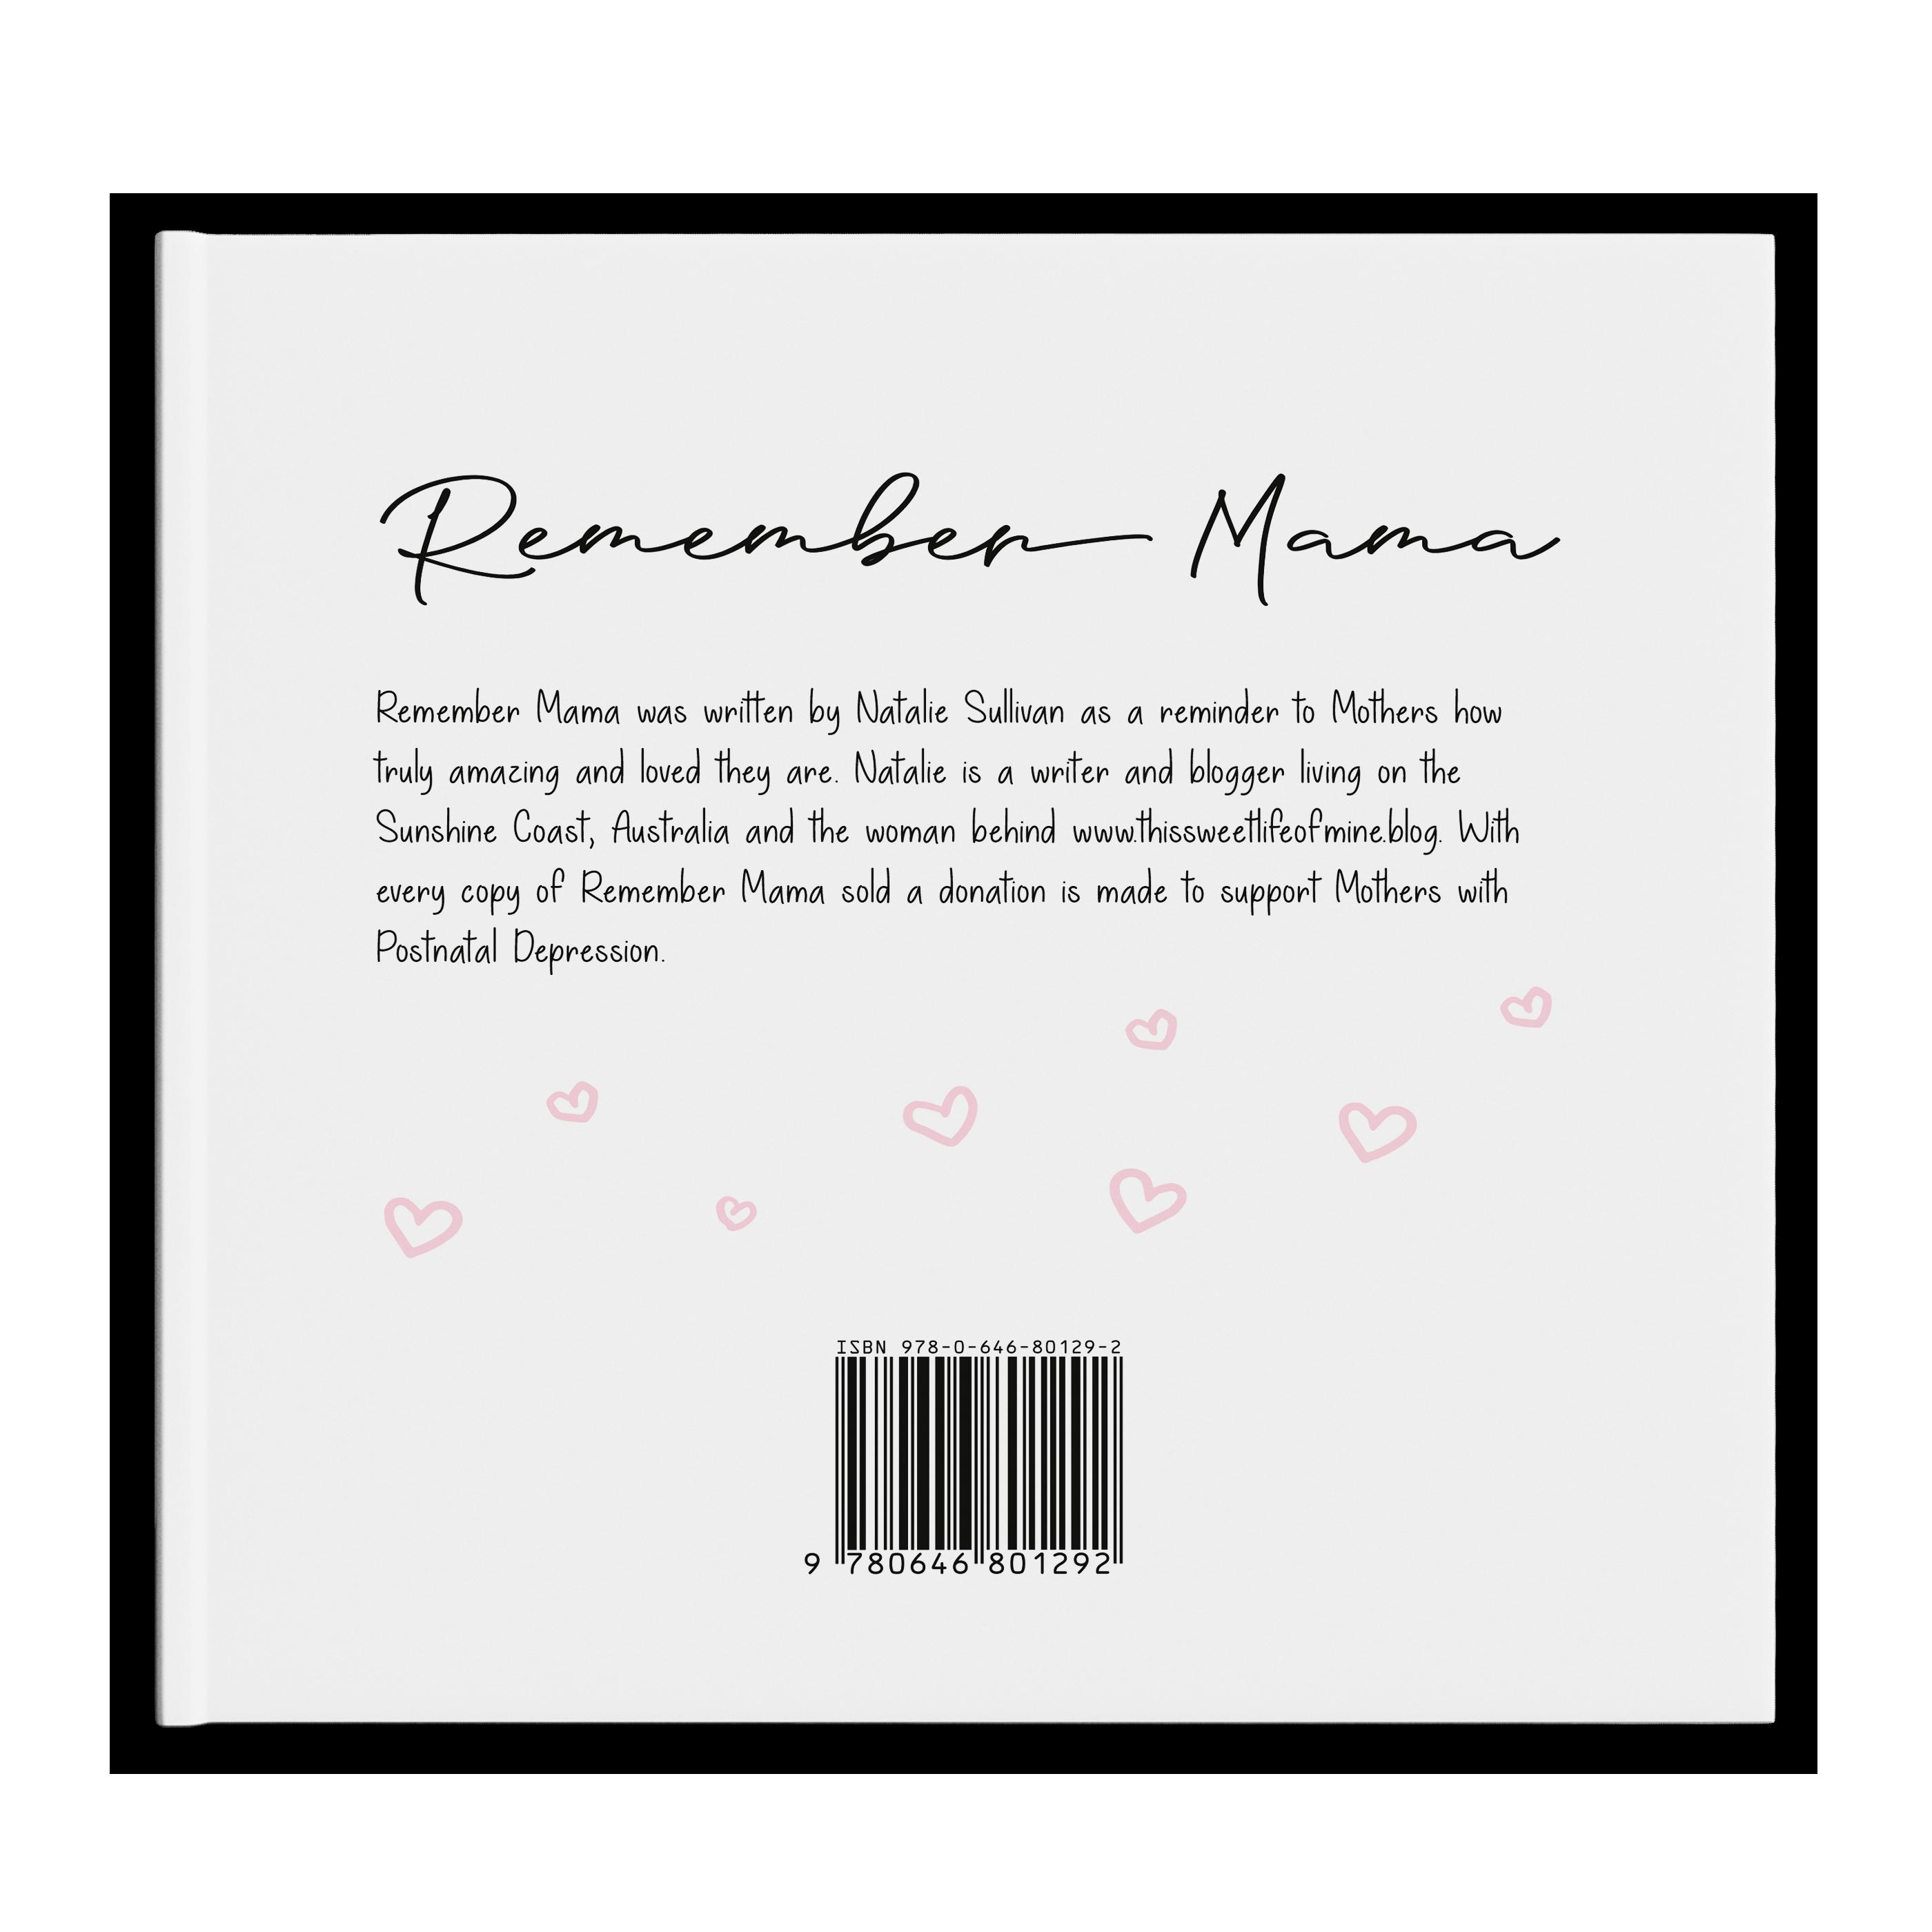 RememberMama-BackCover-MockUp